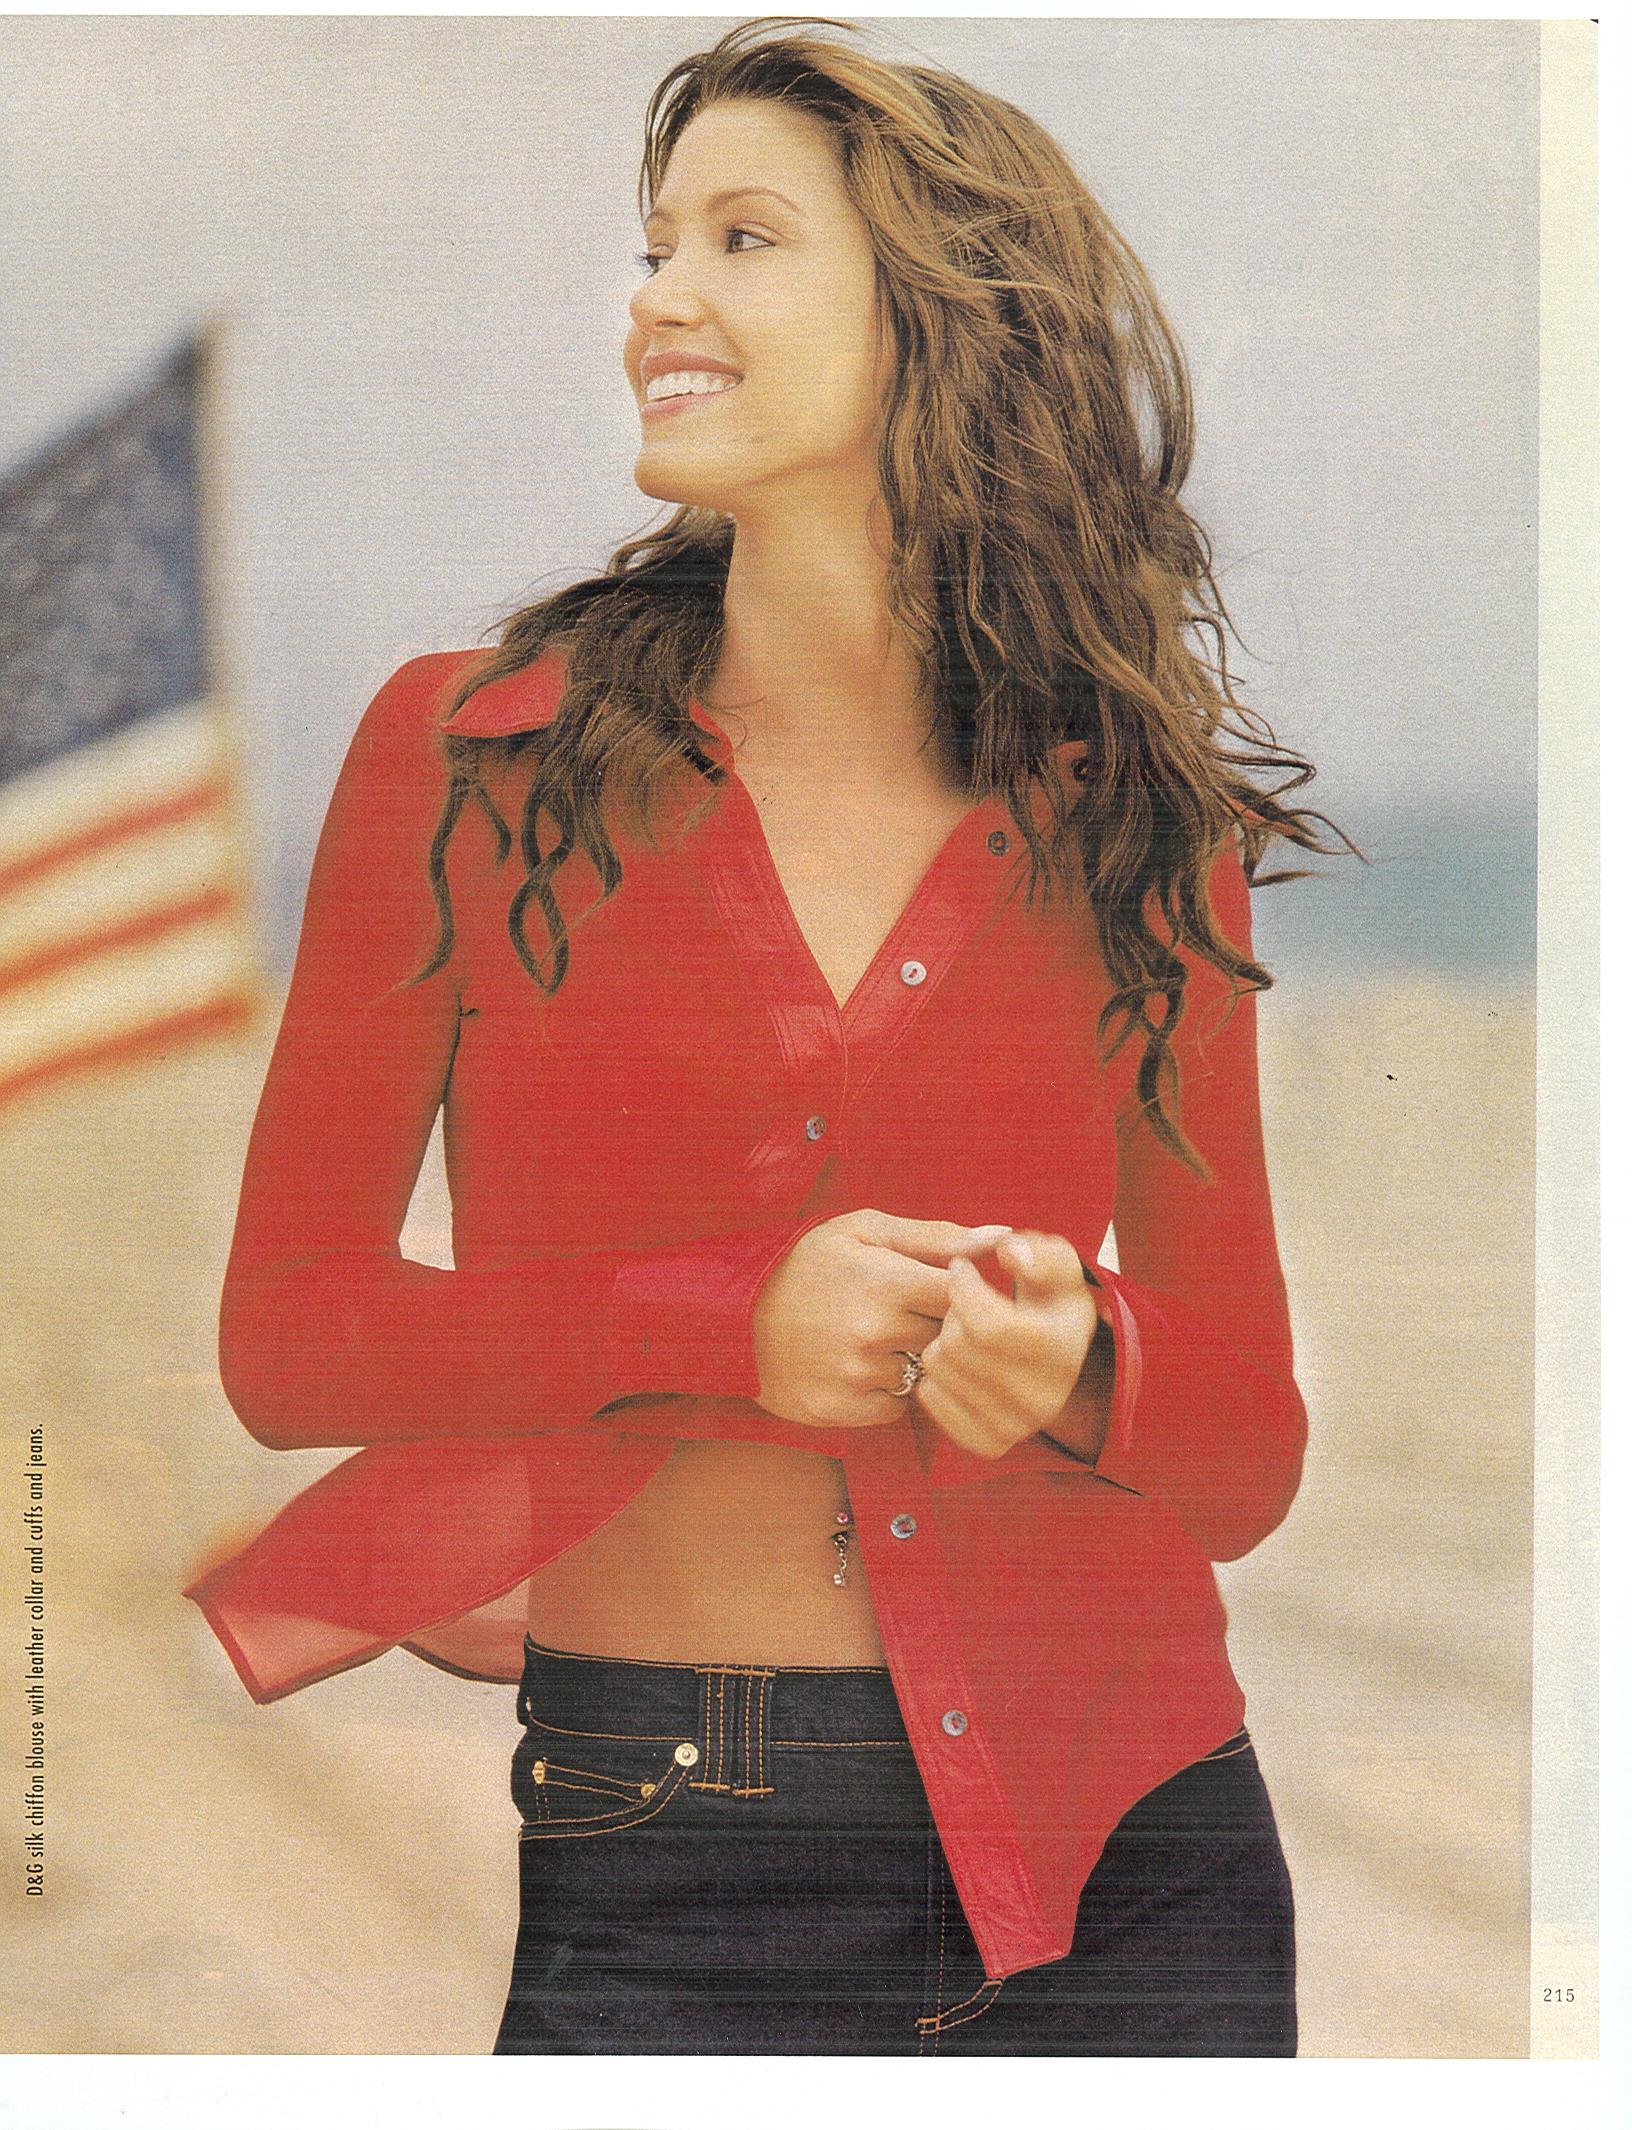 SE_Hamptons Magazine_2001_7.jpg